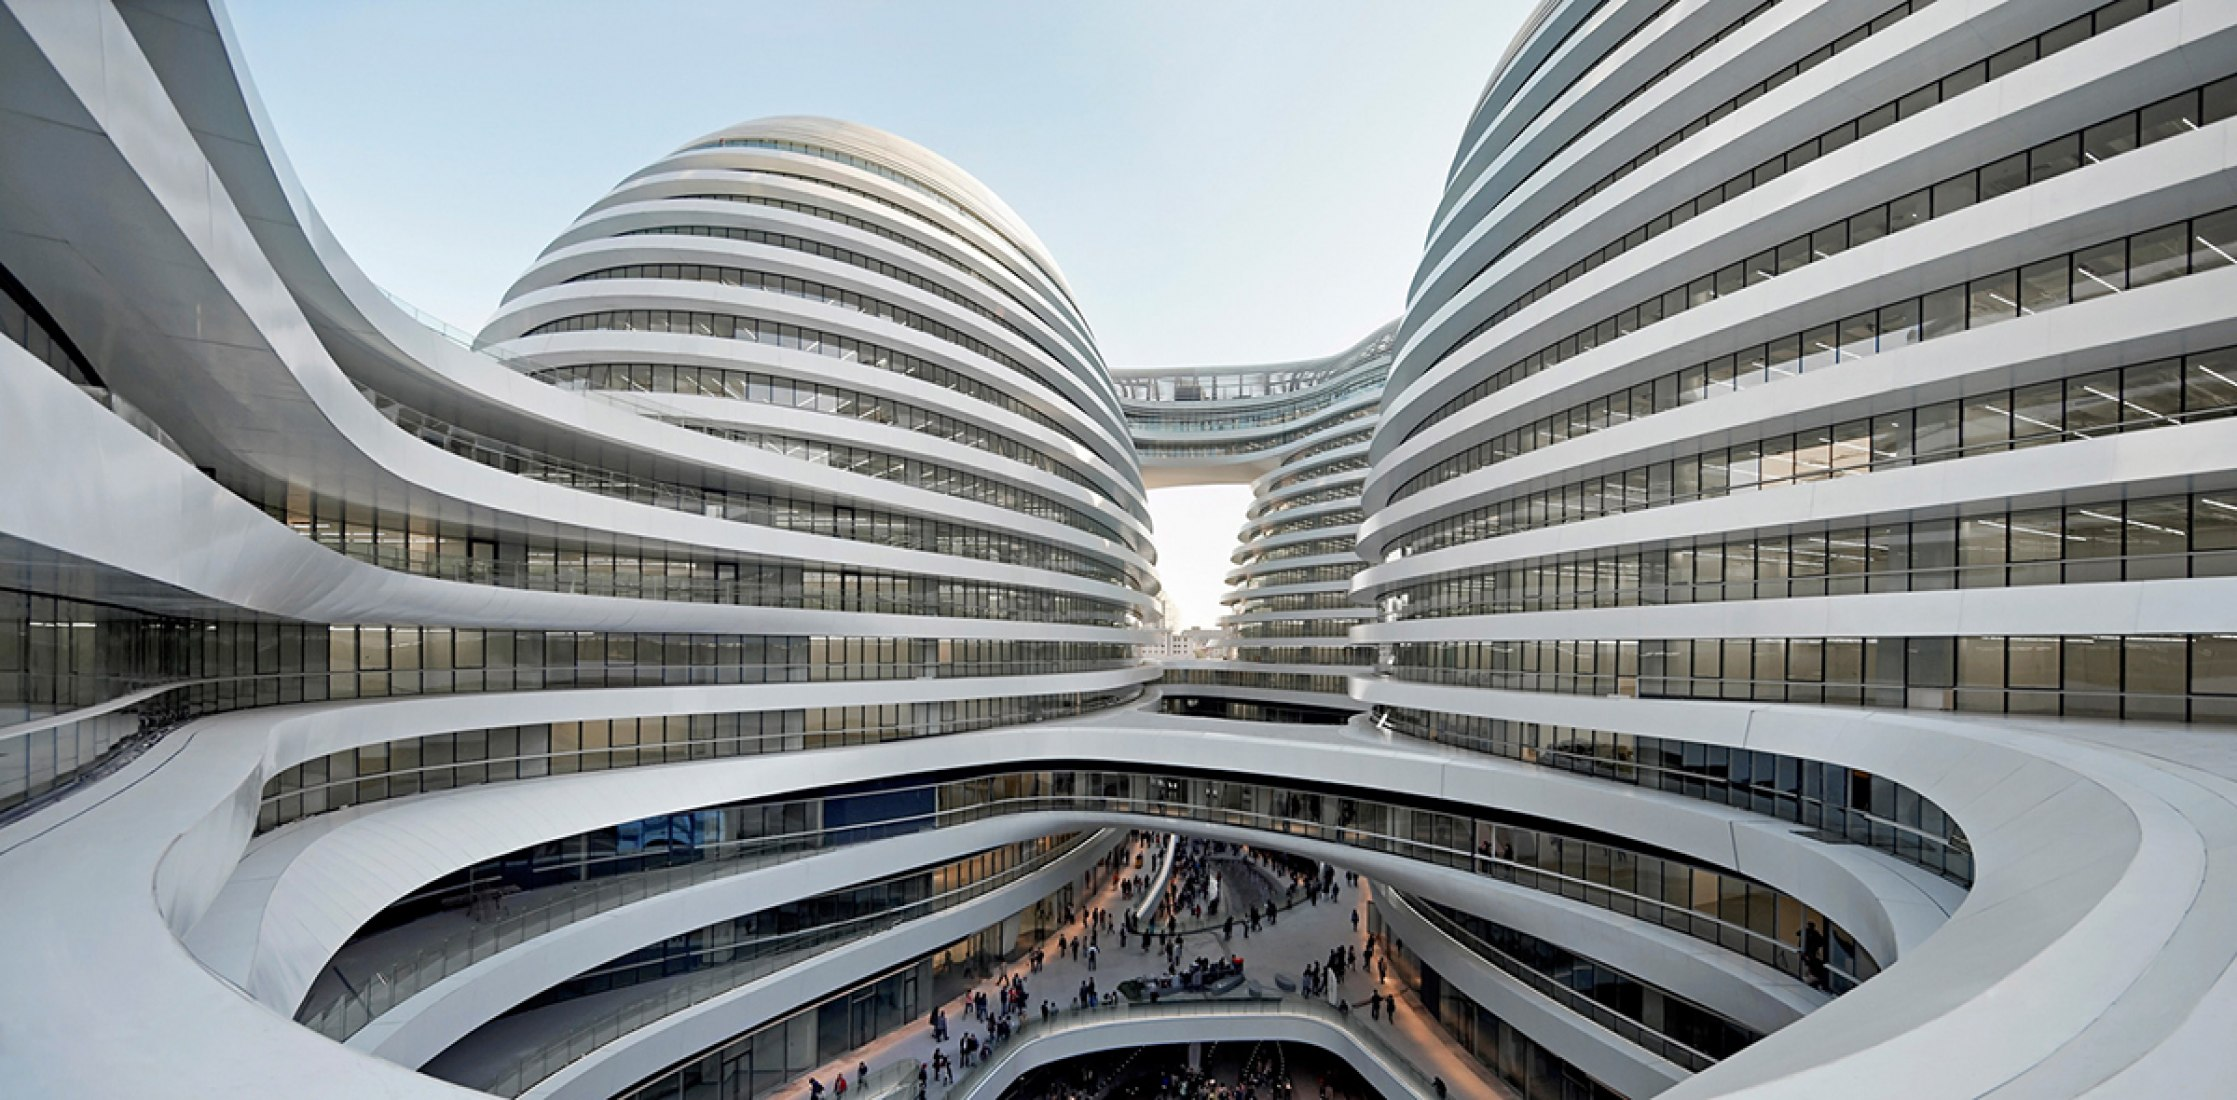 Galaxy Soho, Pekín, China por Zaha Hadid Architects. Fotografía © Iwan Baan.